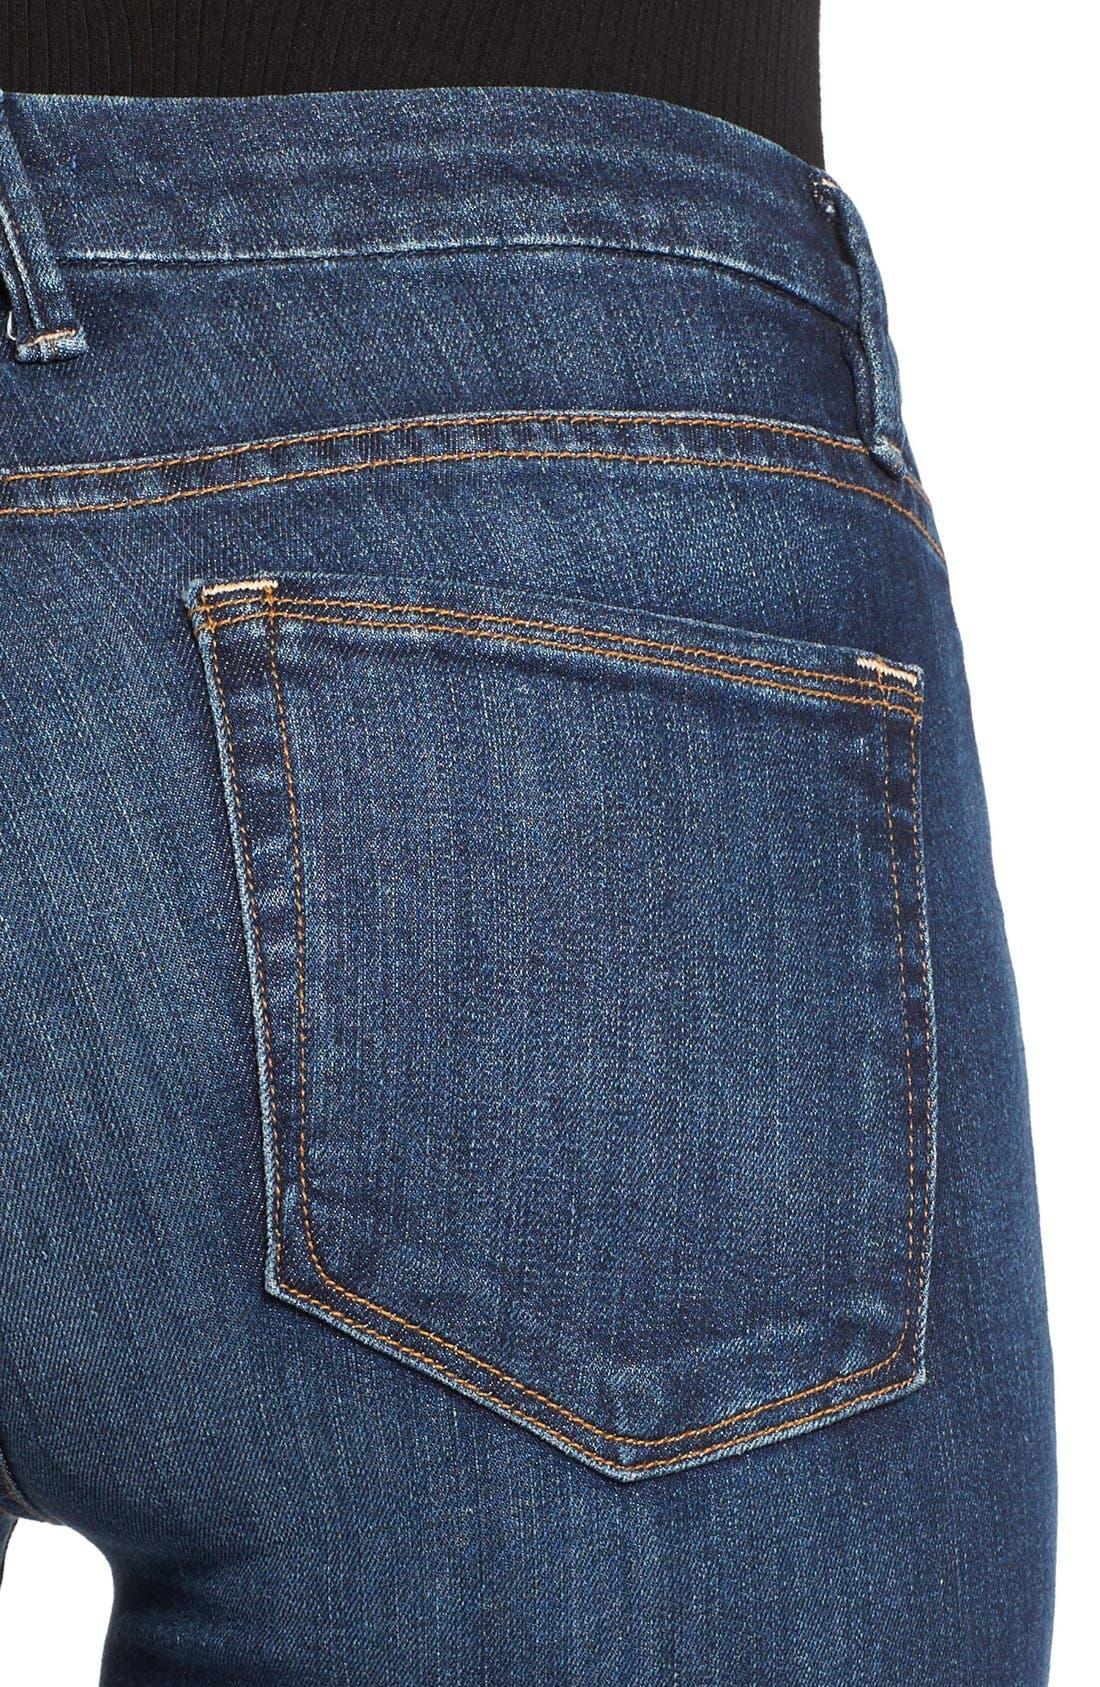 Alternate Image 4  - Good American Good Legs High Rise Skinny Jeans (Blue 004)